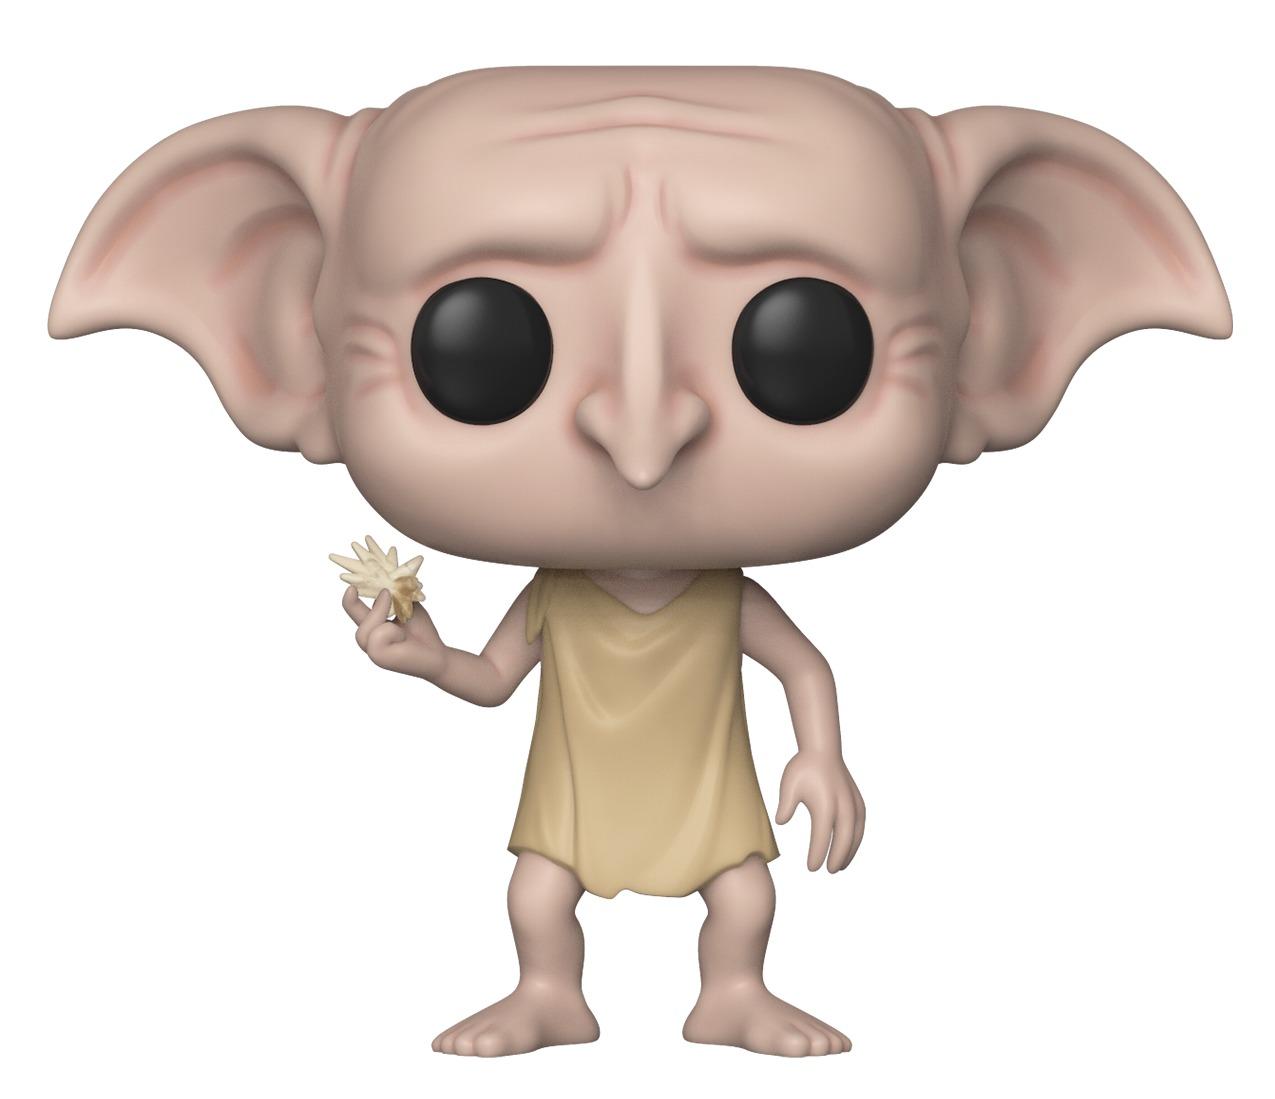 Harry Potter - Dobby (Snapping Fingers) Pop! Vinyl Figure image